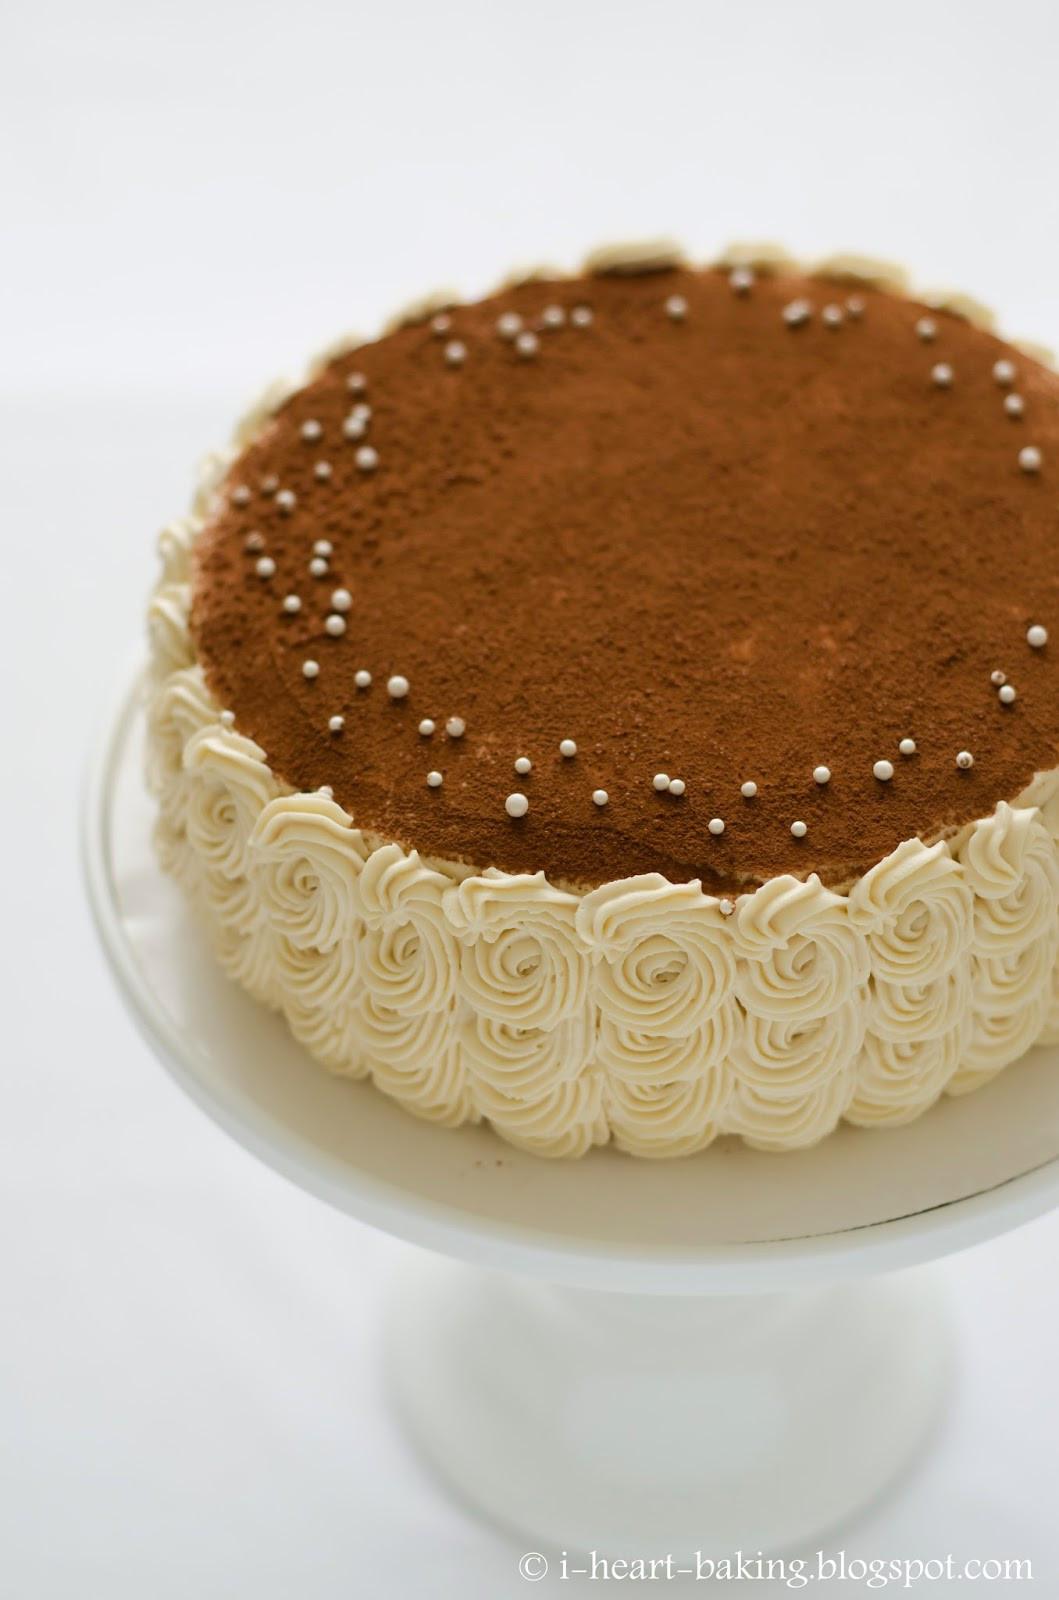 Best ideas about Tiramisu Birthday Cake . Save or Pin i heart baking tiramisu birthday cake with piped swirl Now.